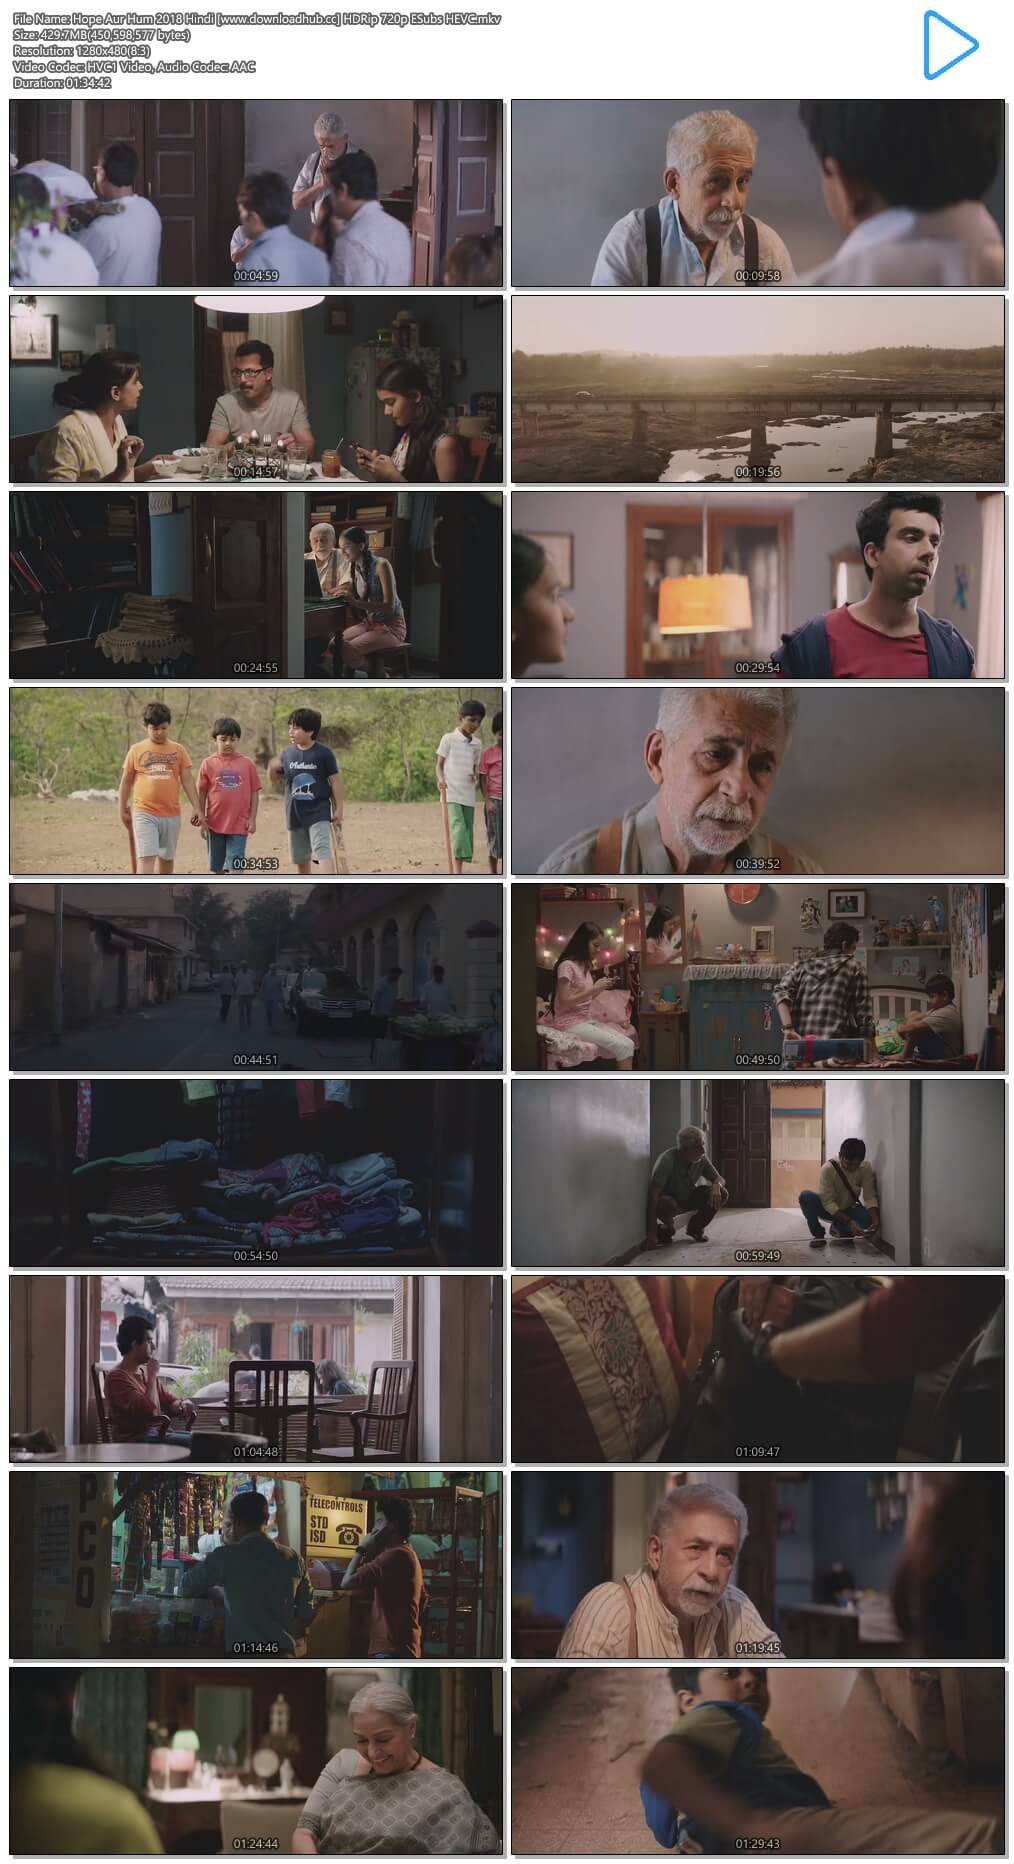 Hope Aur Hum 2018 Hindi 400MB HDRip 720p ESubs HEVC